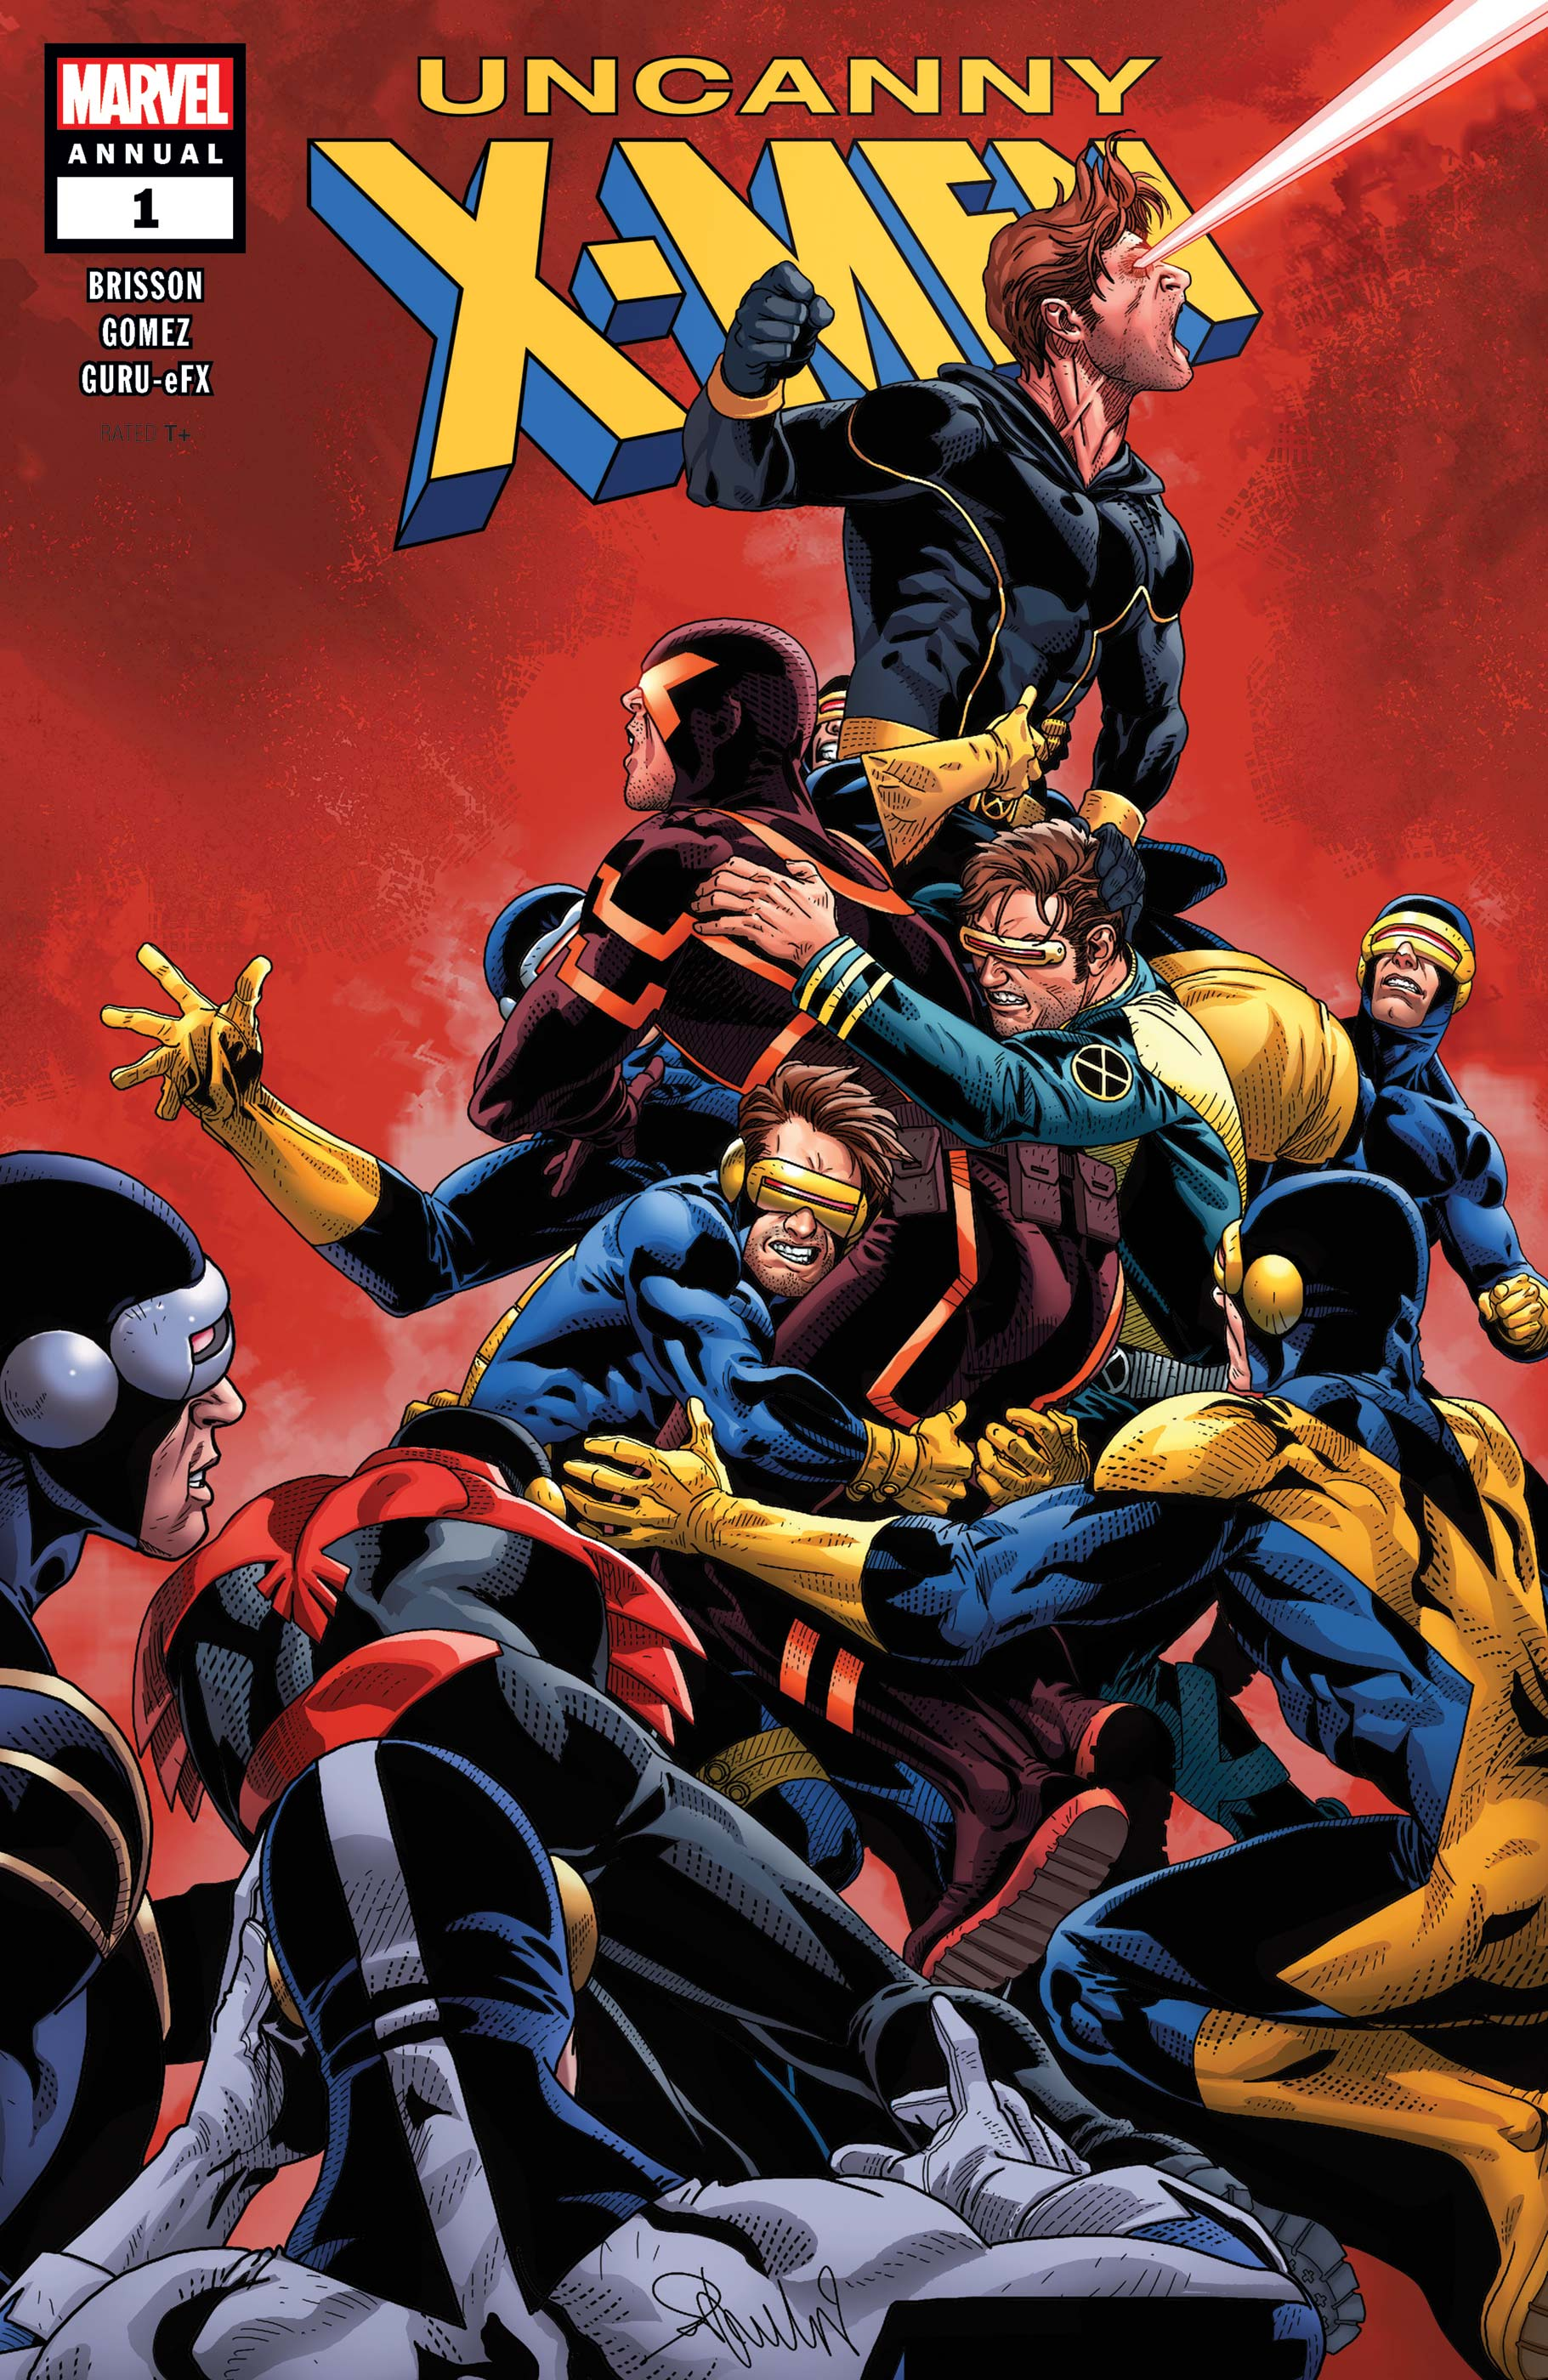 Uncanny X-Men Annual (2019) #1